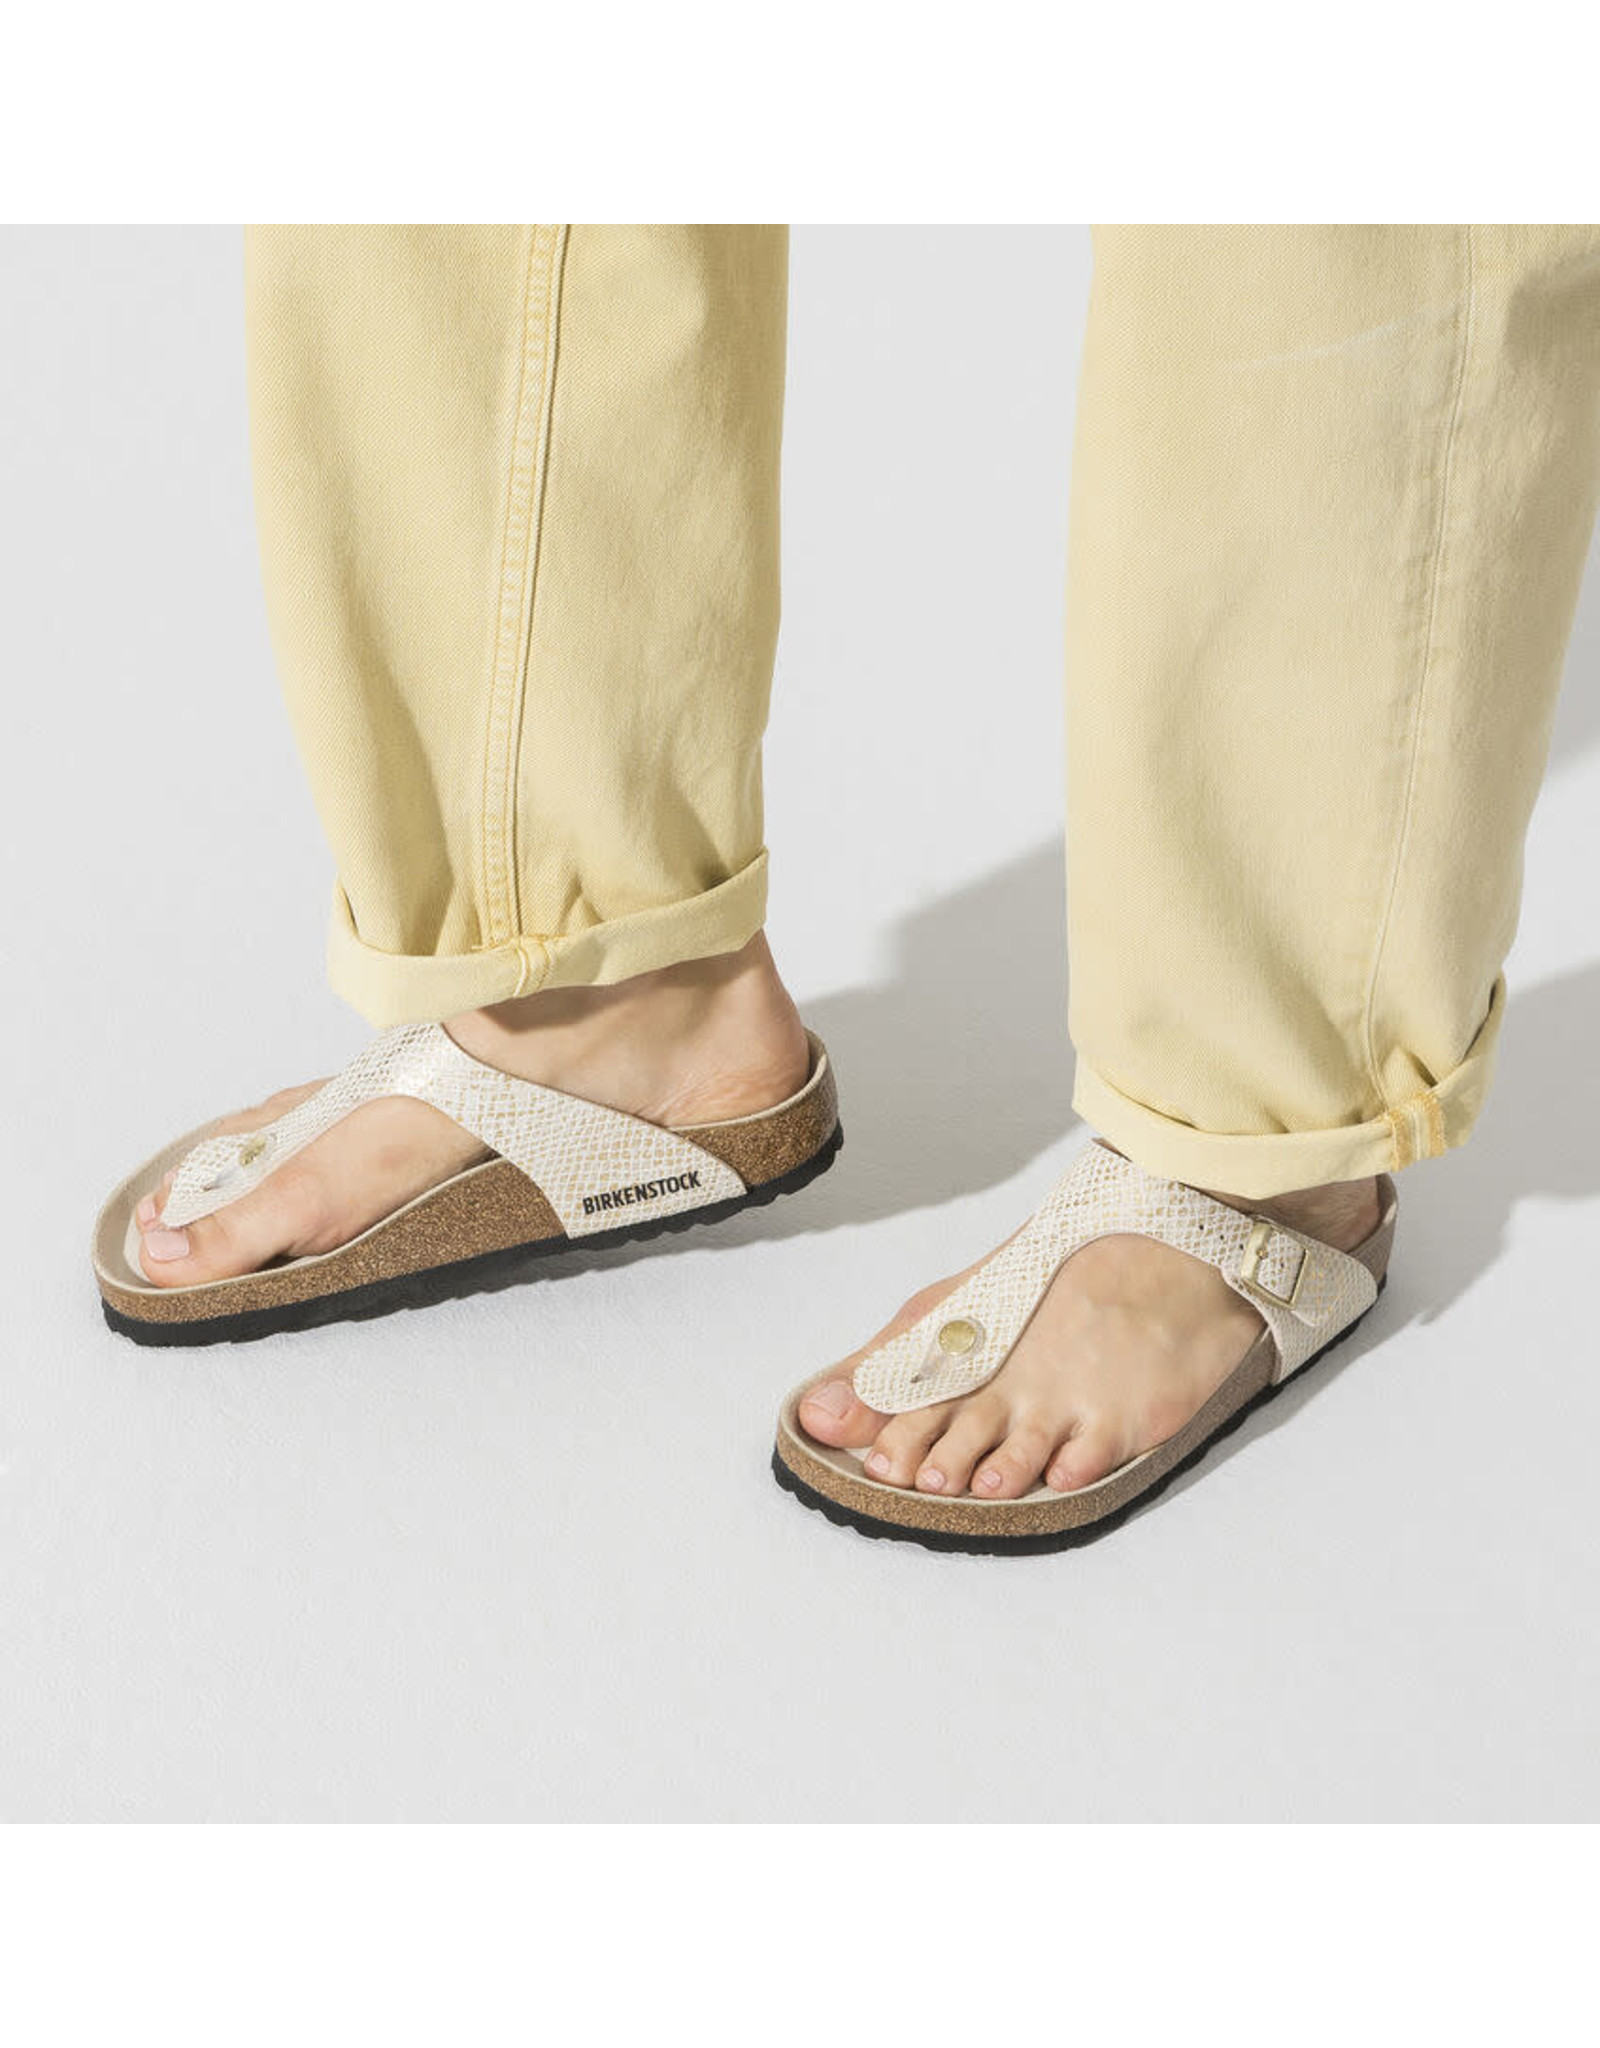 Birkenstock Gizeh Shiny Python Microfiber Sandal